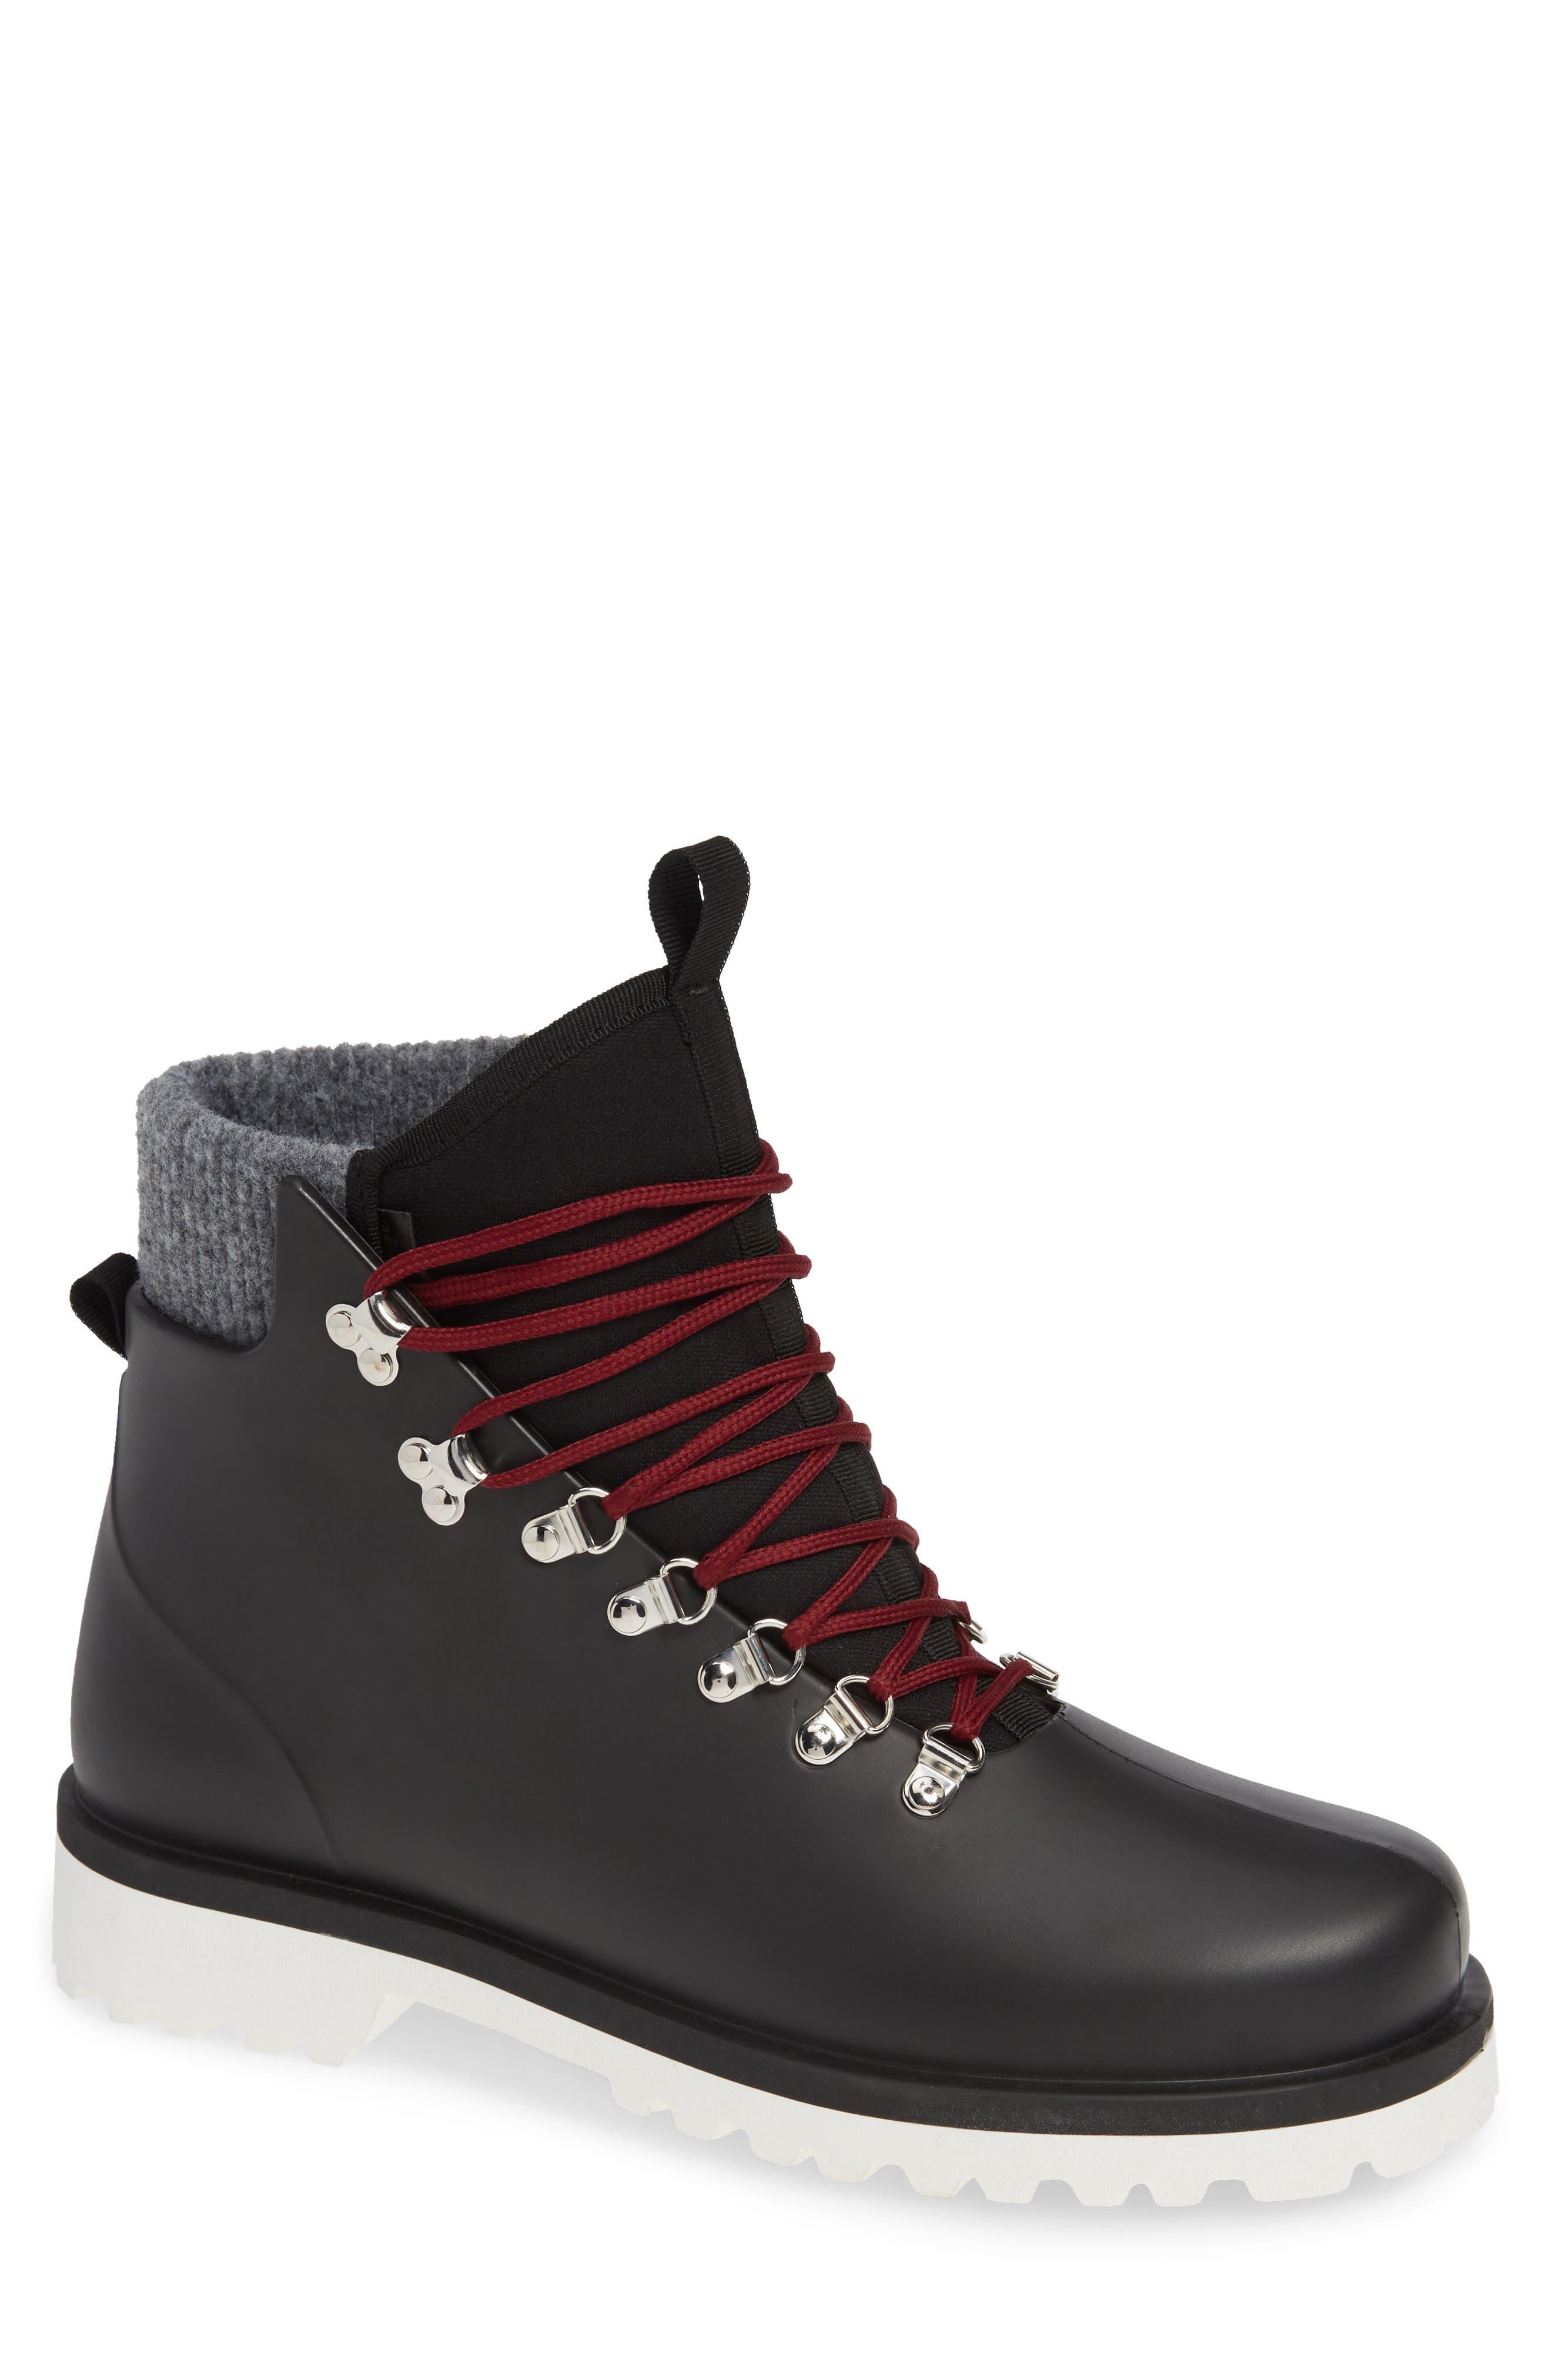 Brother x Frère Alpine Rain Boot,                         Main,                         color, BLACK